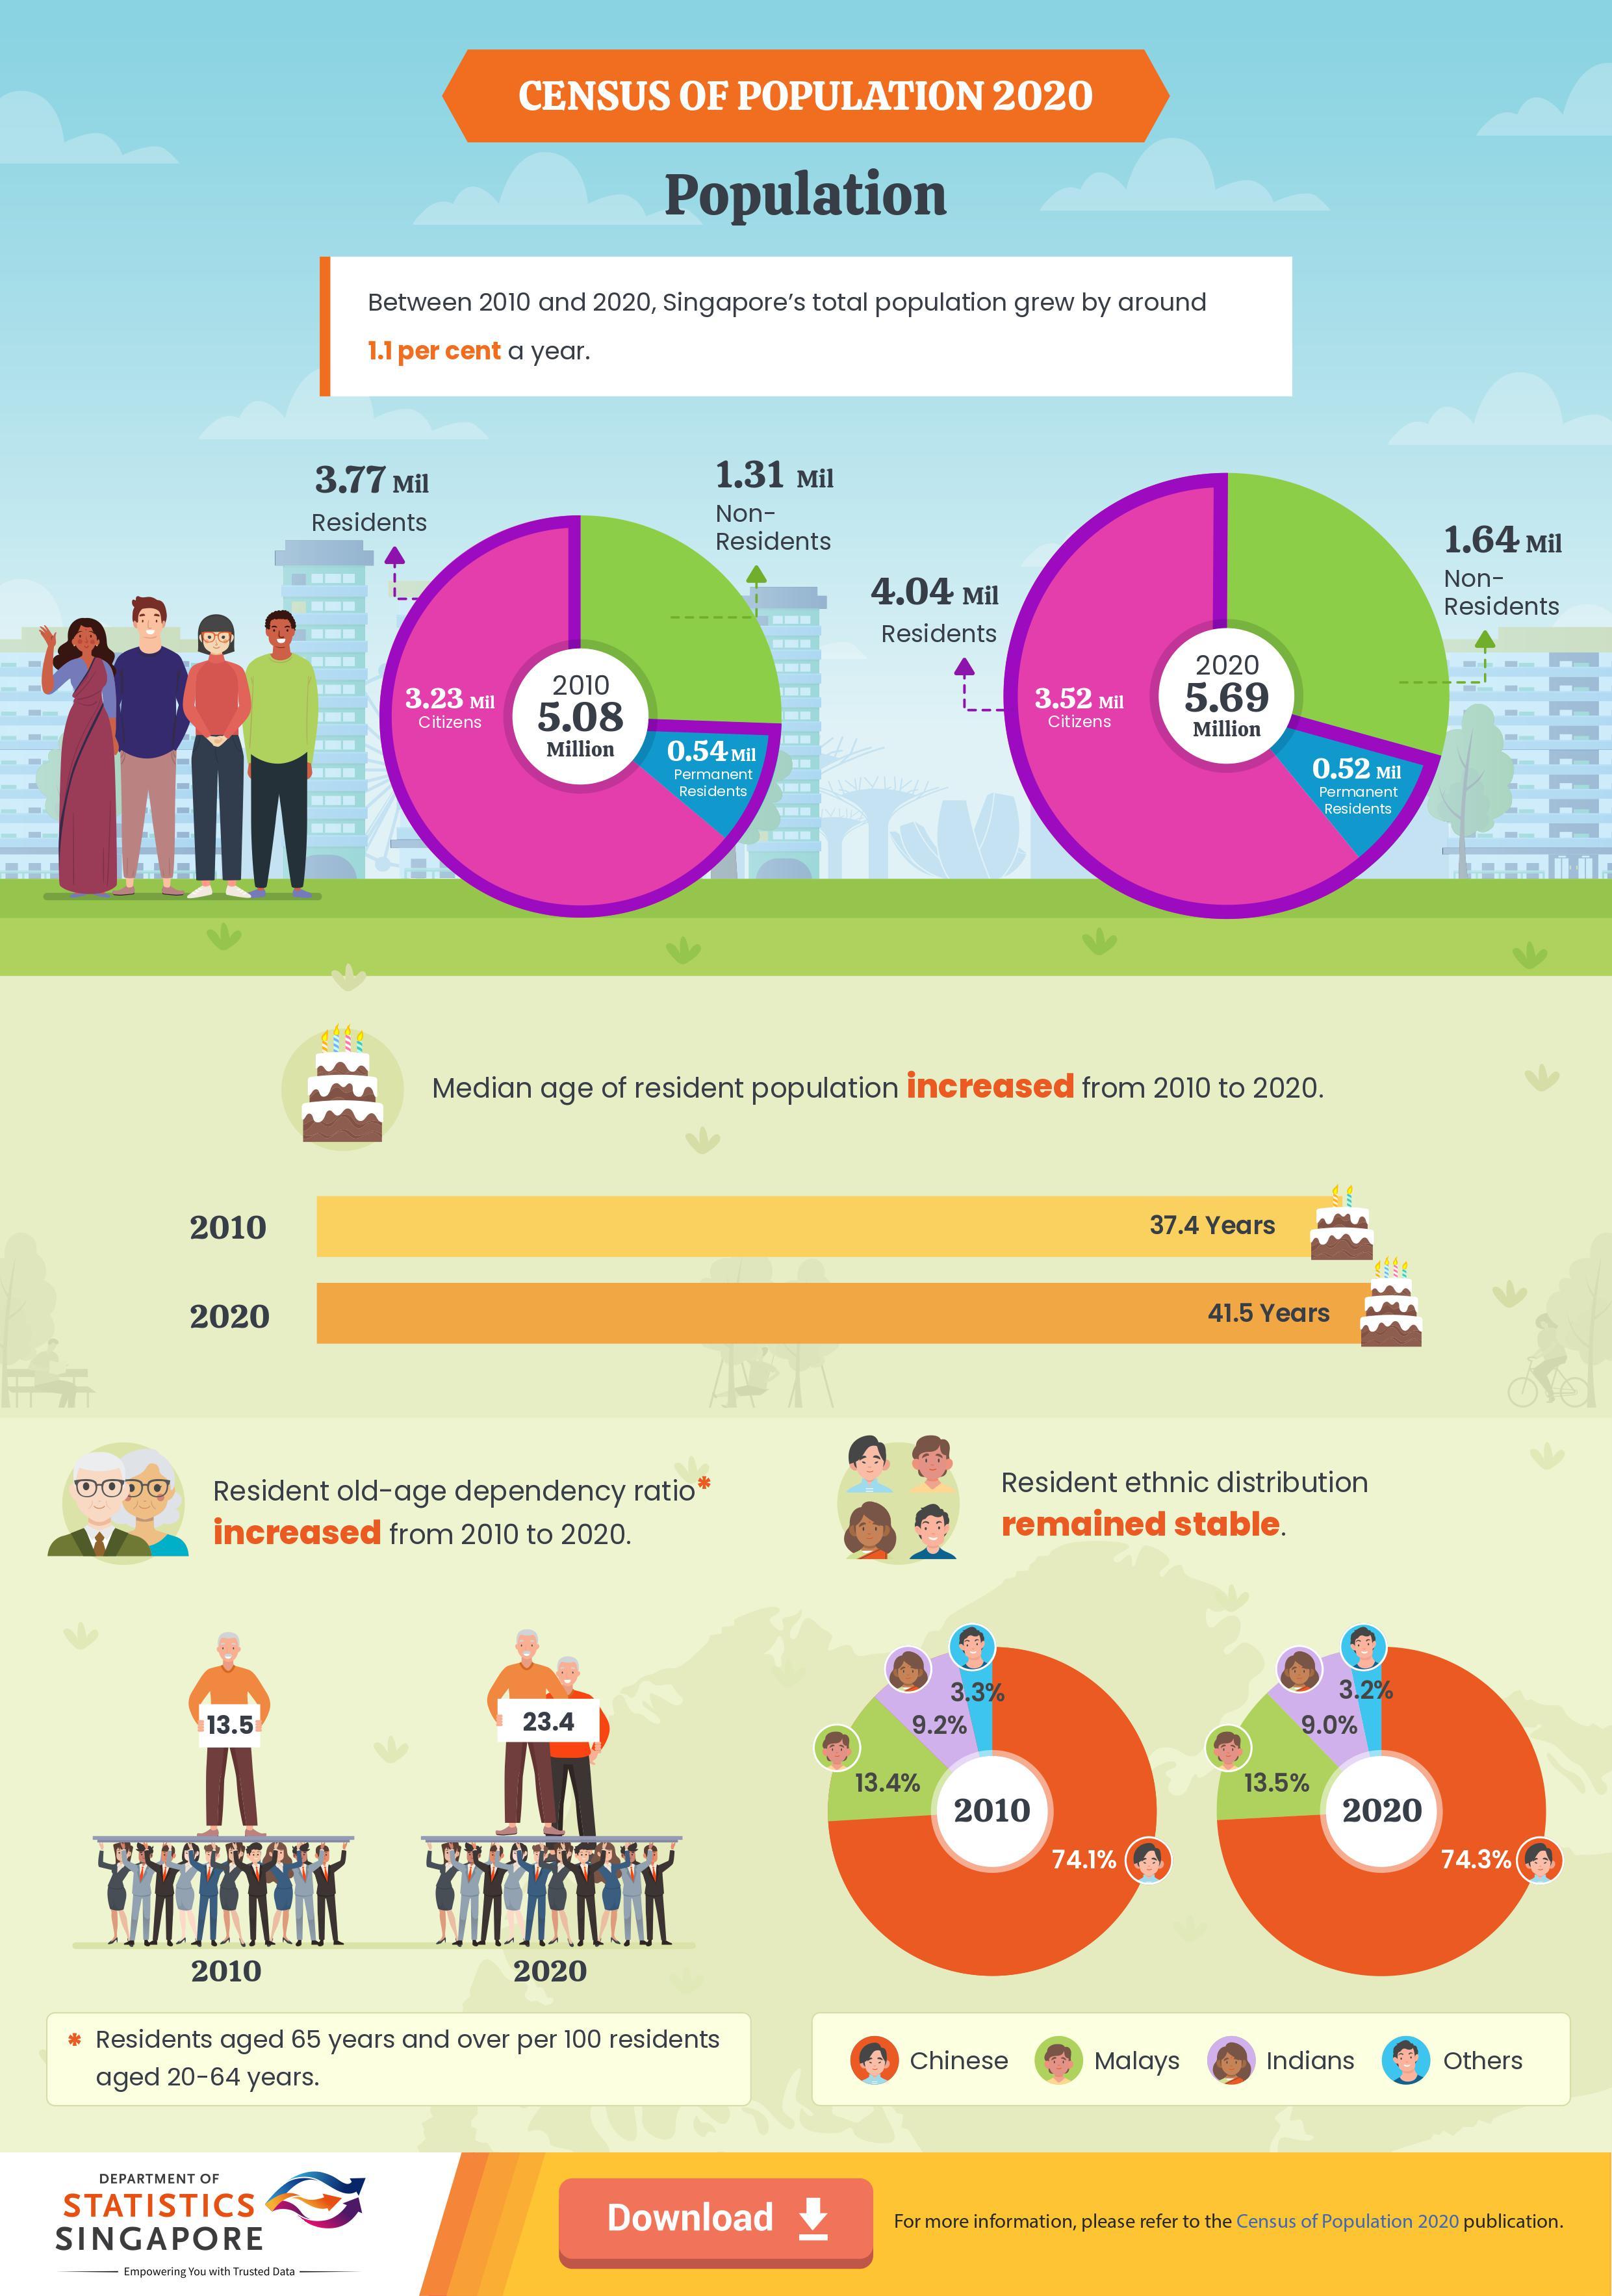 Census of Population 2020 - Population